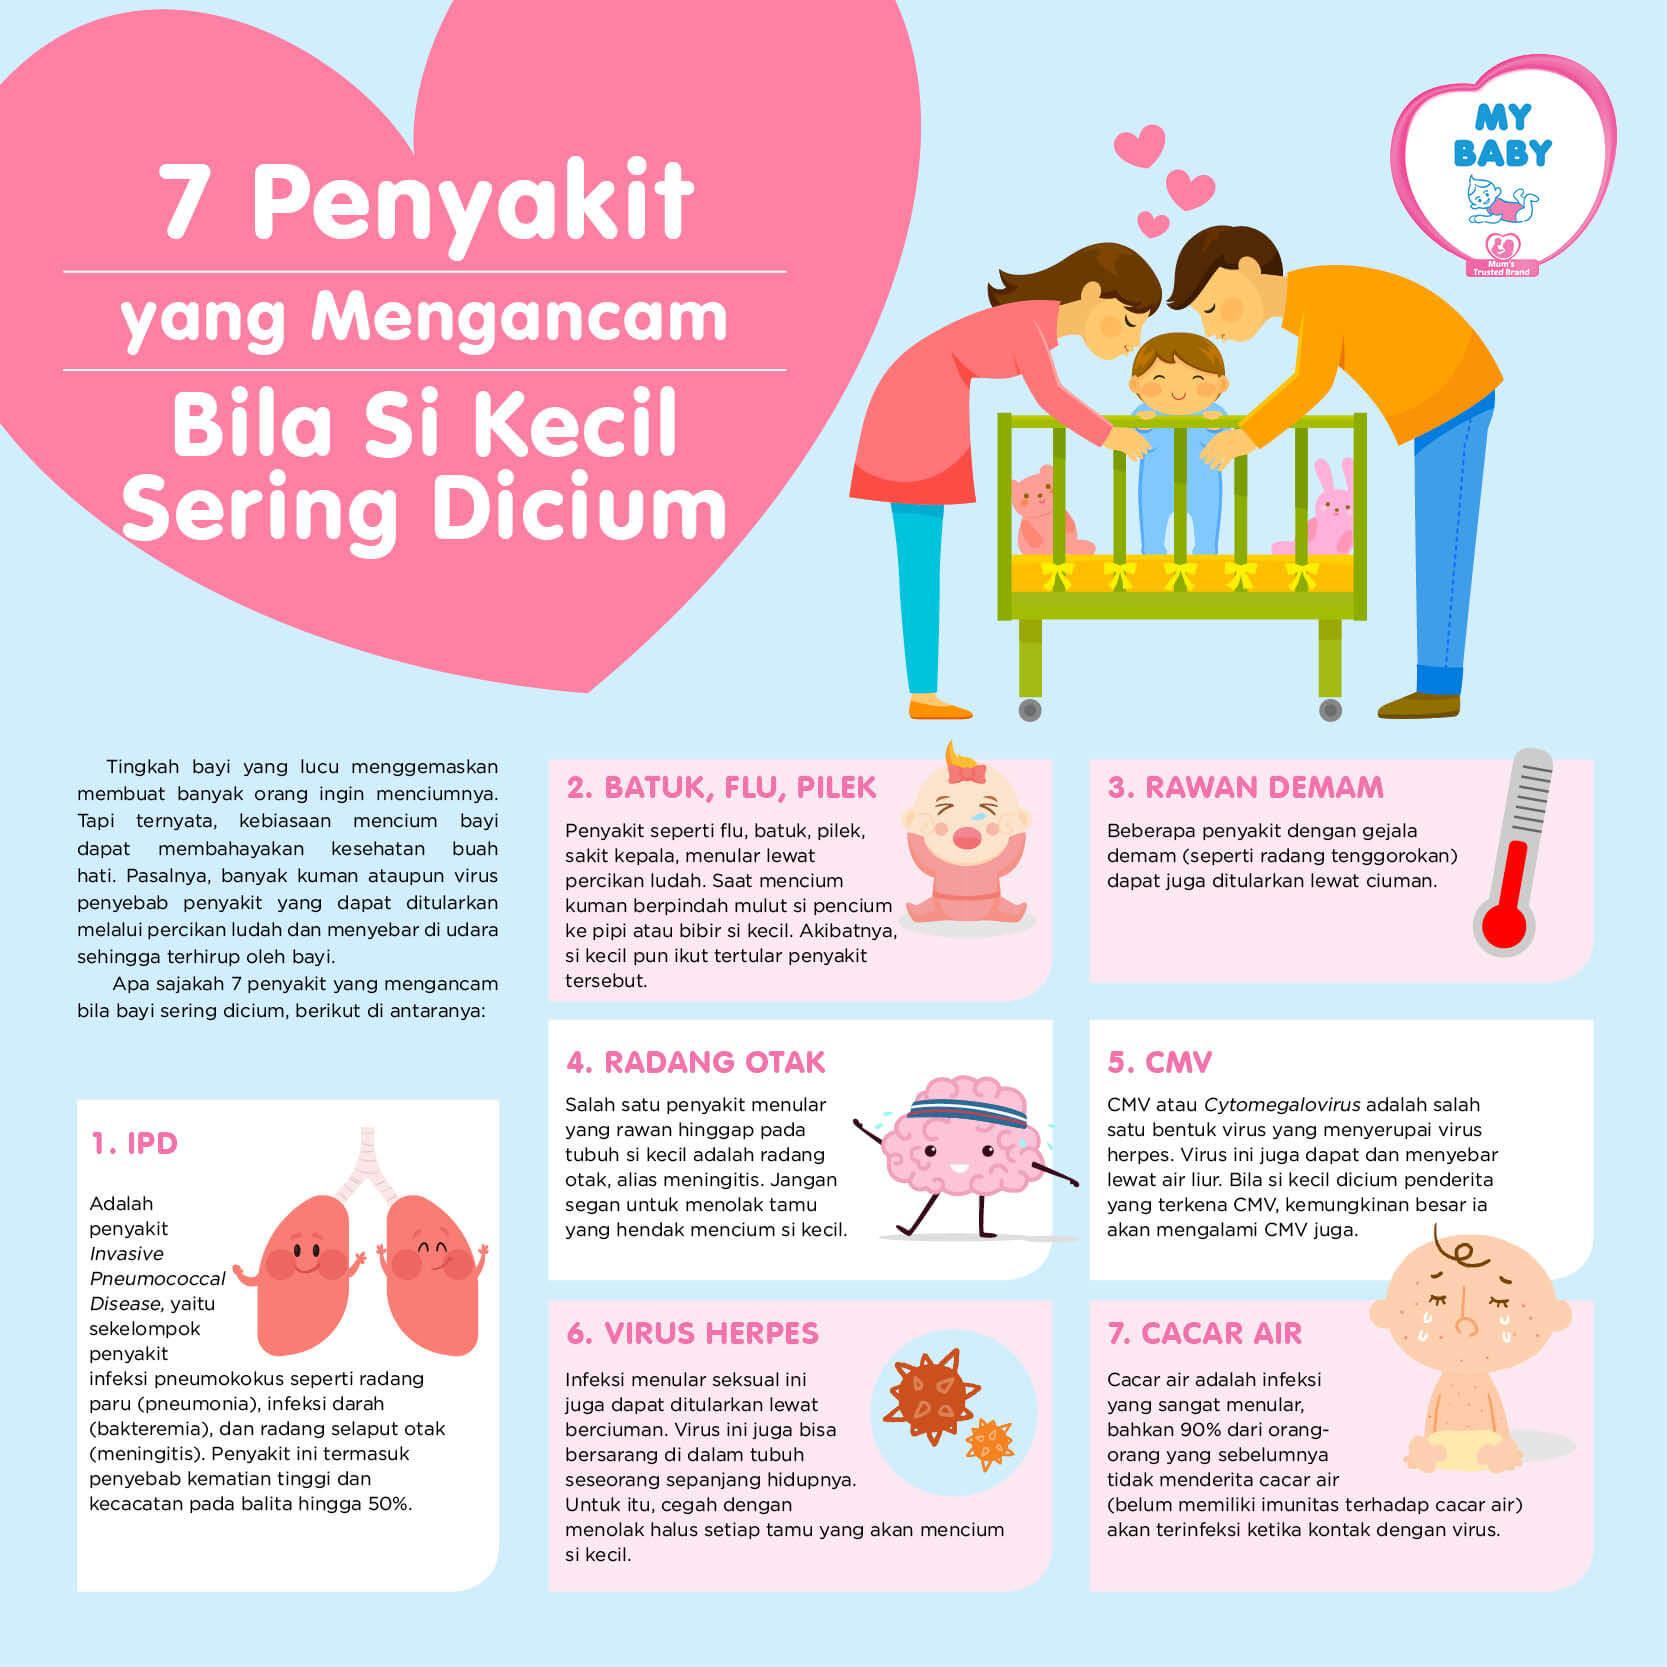 7 Penyakit Yang Mengancam Bila Si Kecil Sering Dicium